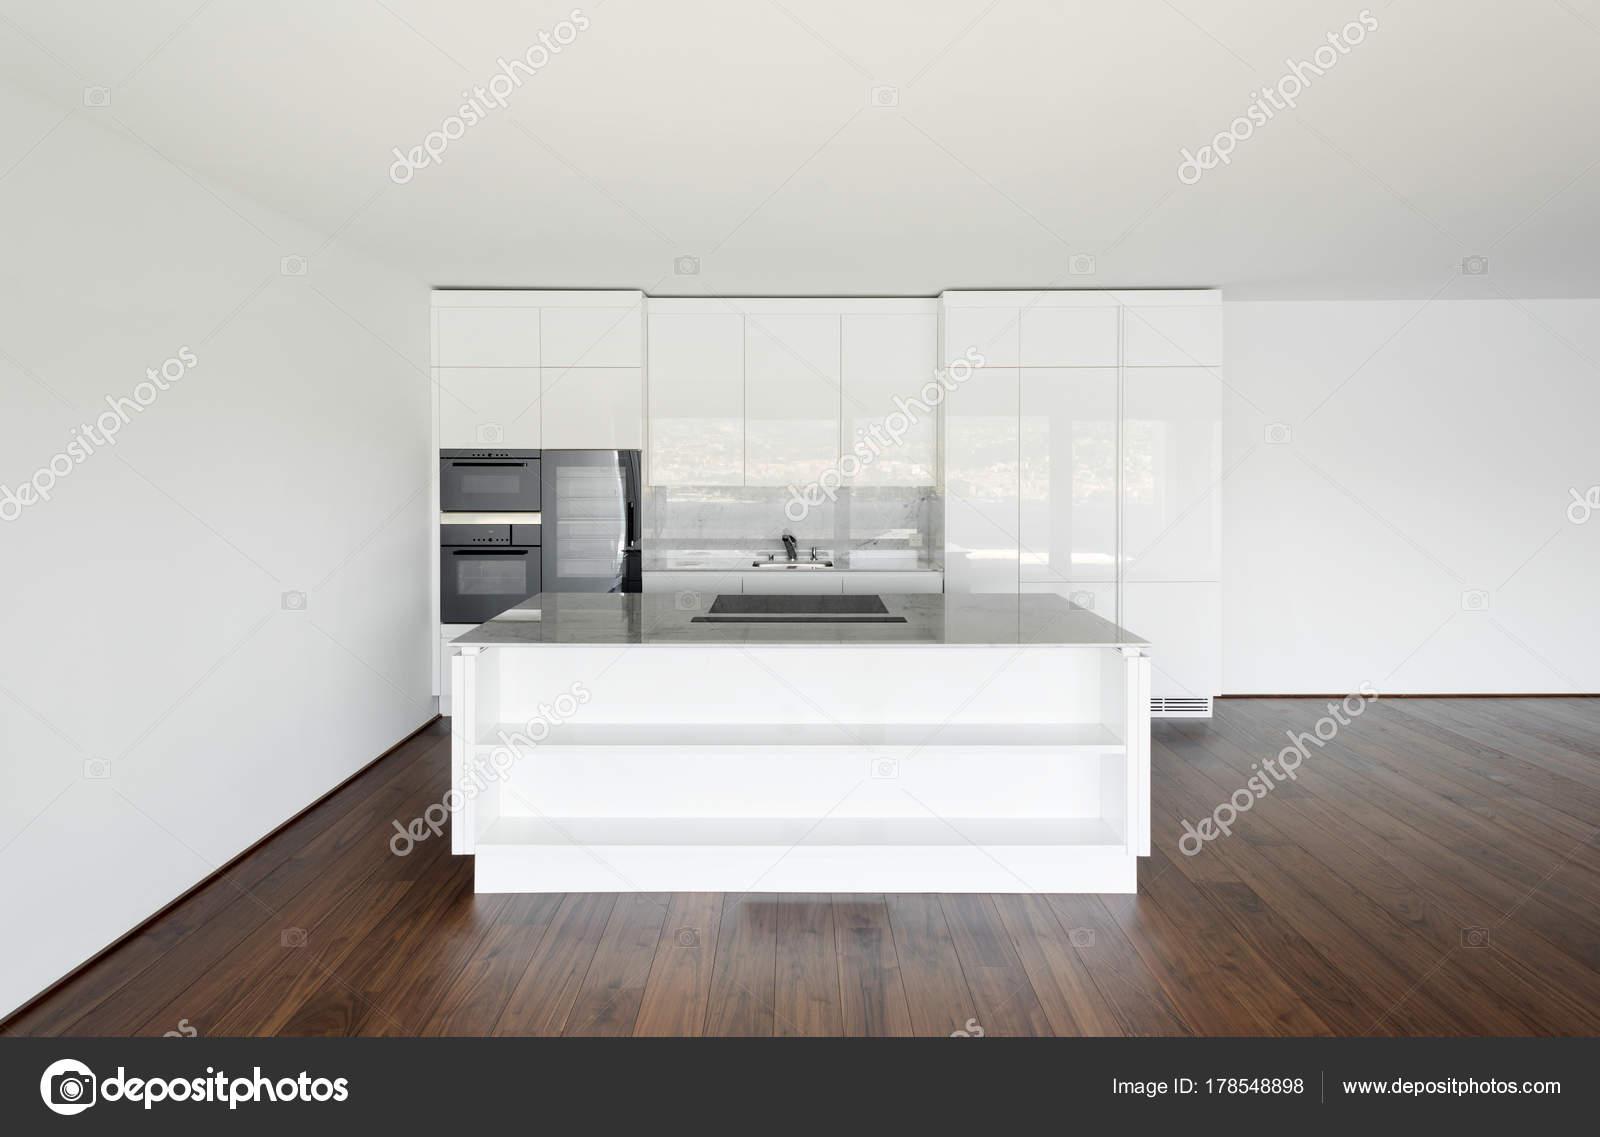 Mooie Witte Keuken : Mooie lege appartement witte keuken u2014 stockfoto © zveiger #178548898